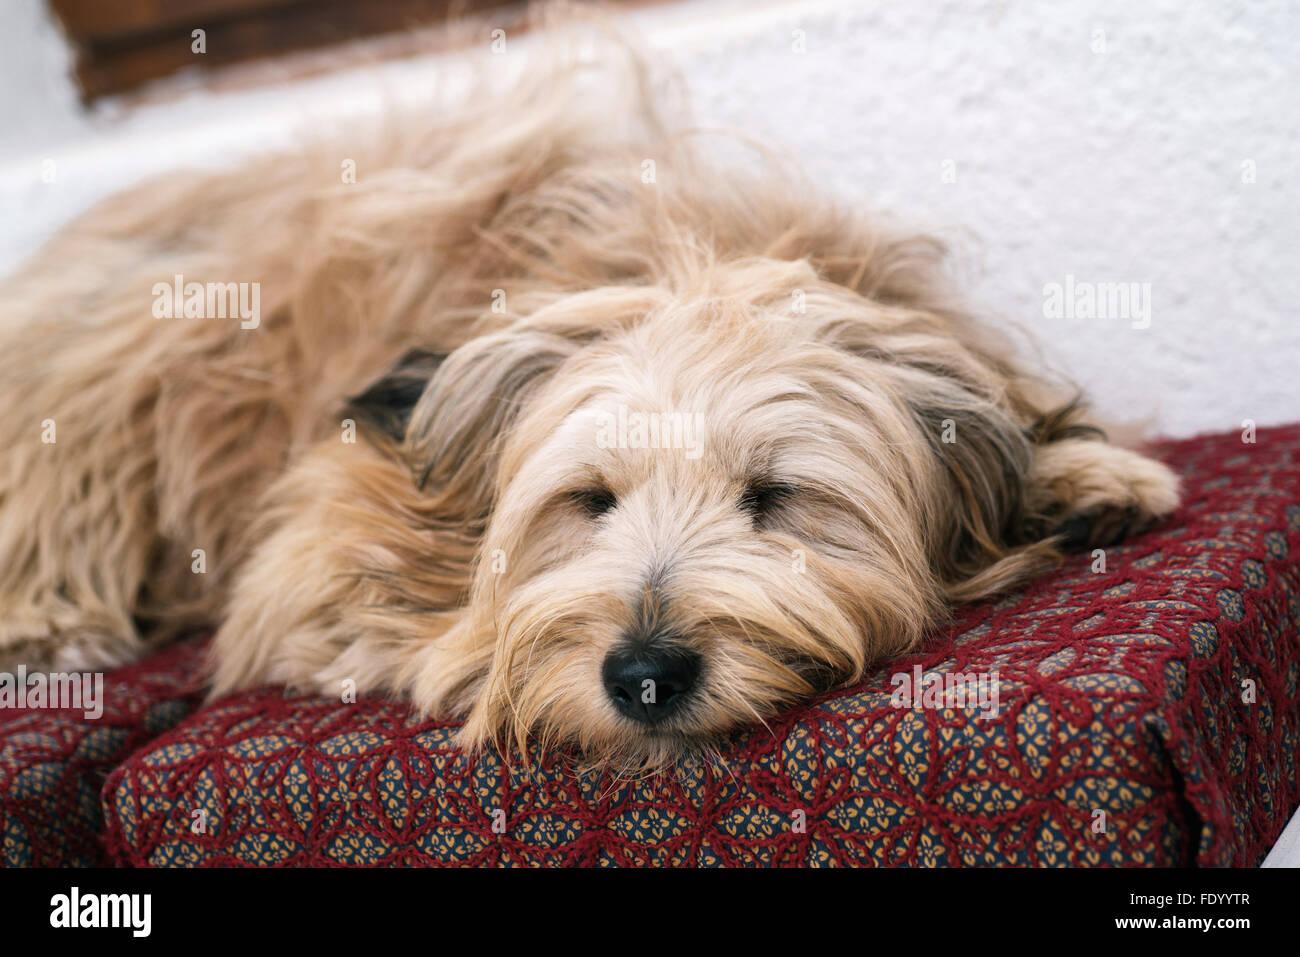 Cute dog in house sleeping - Stock Image